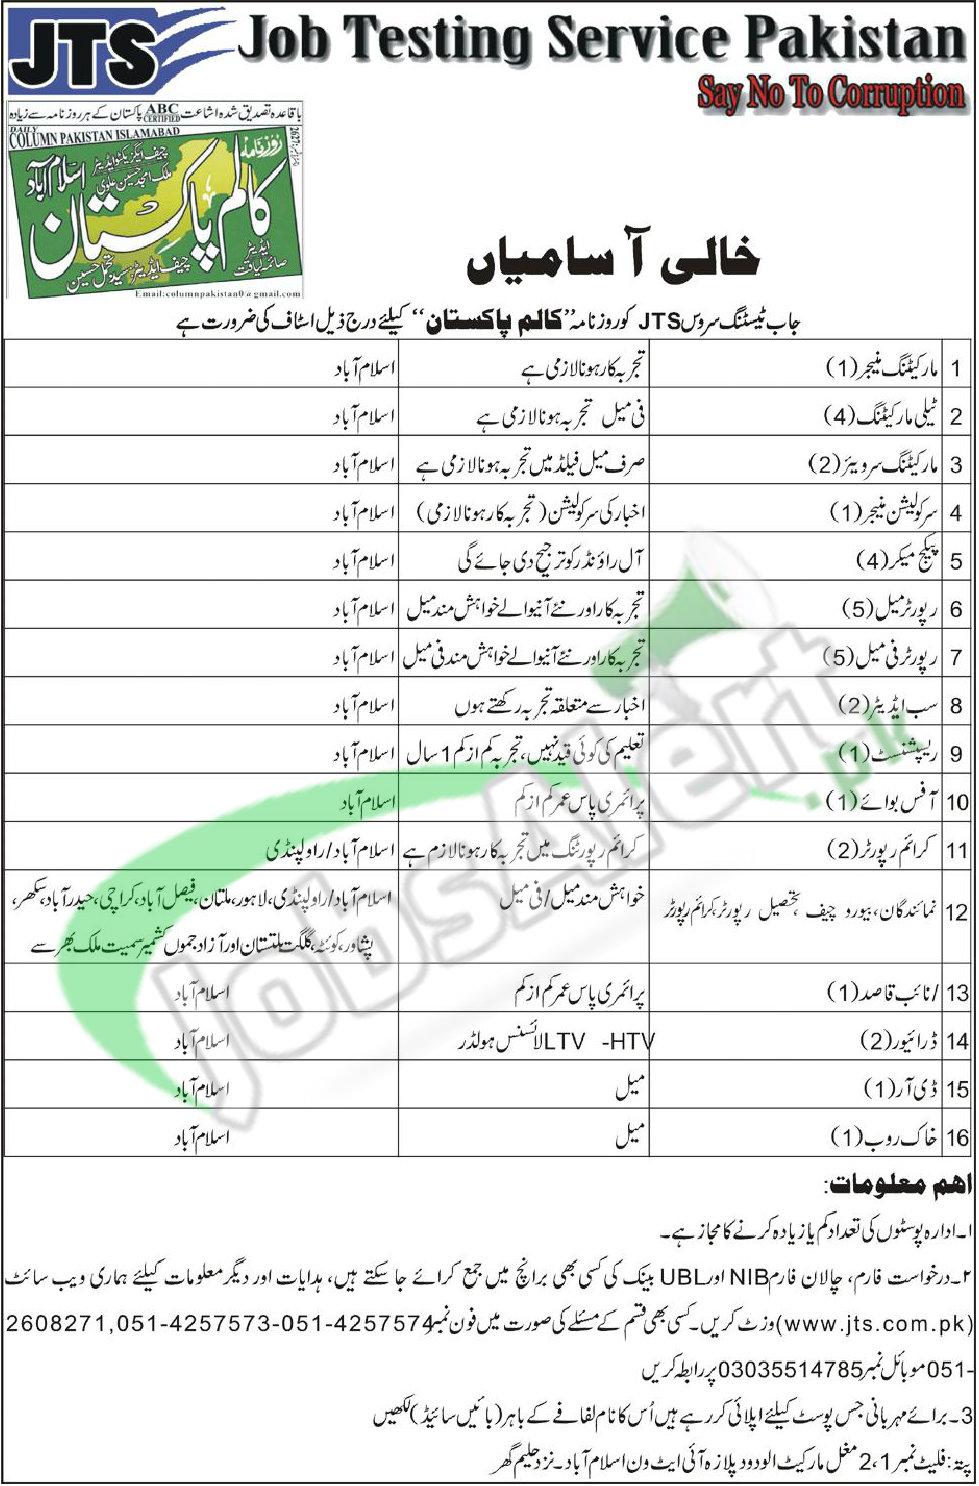 Newspaper Daily Column Pakistan